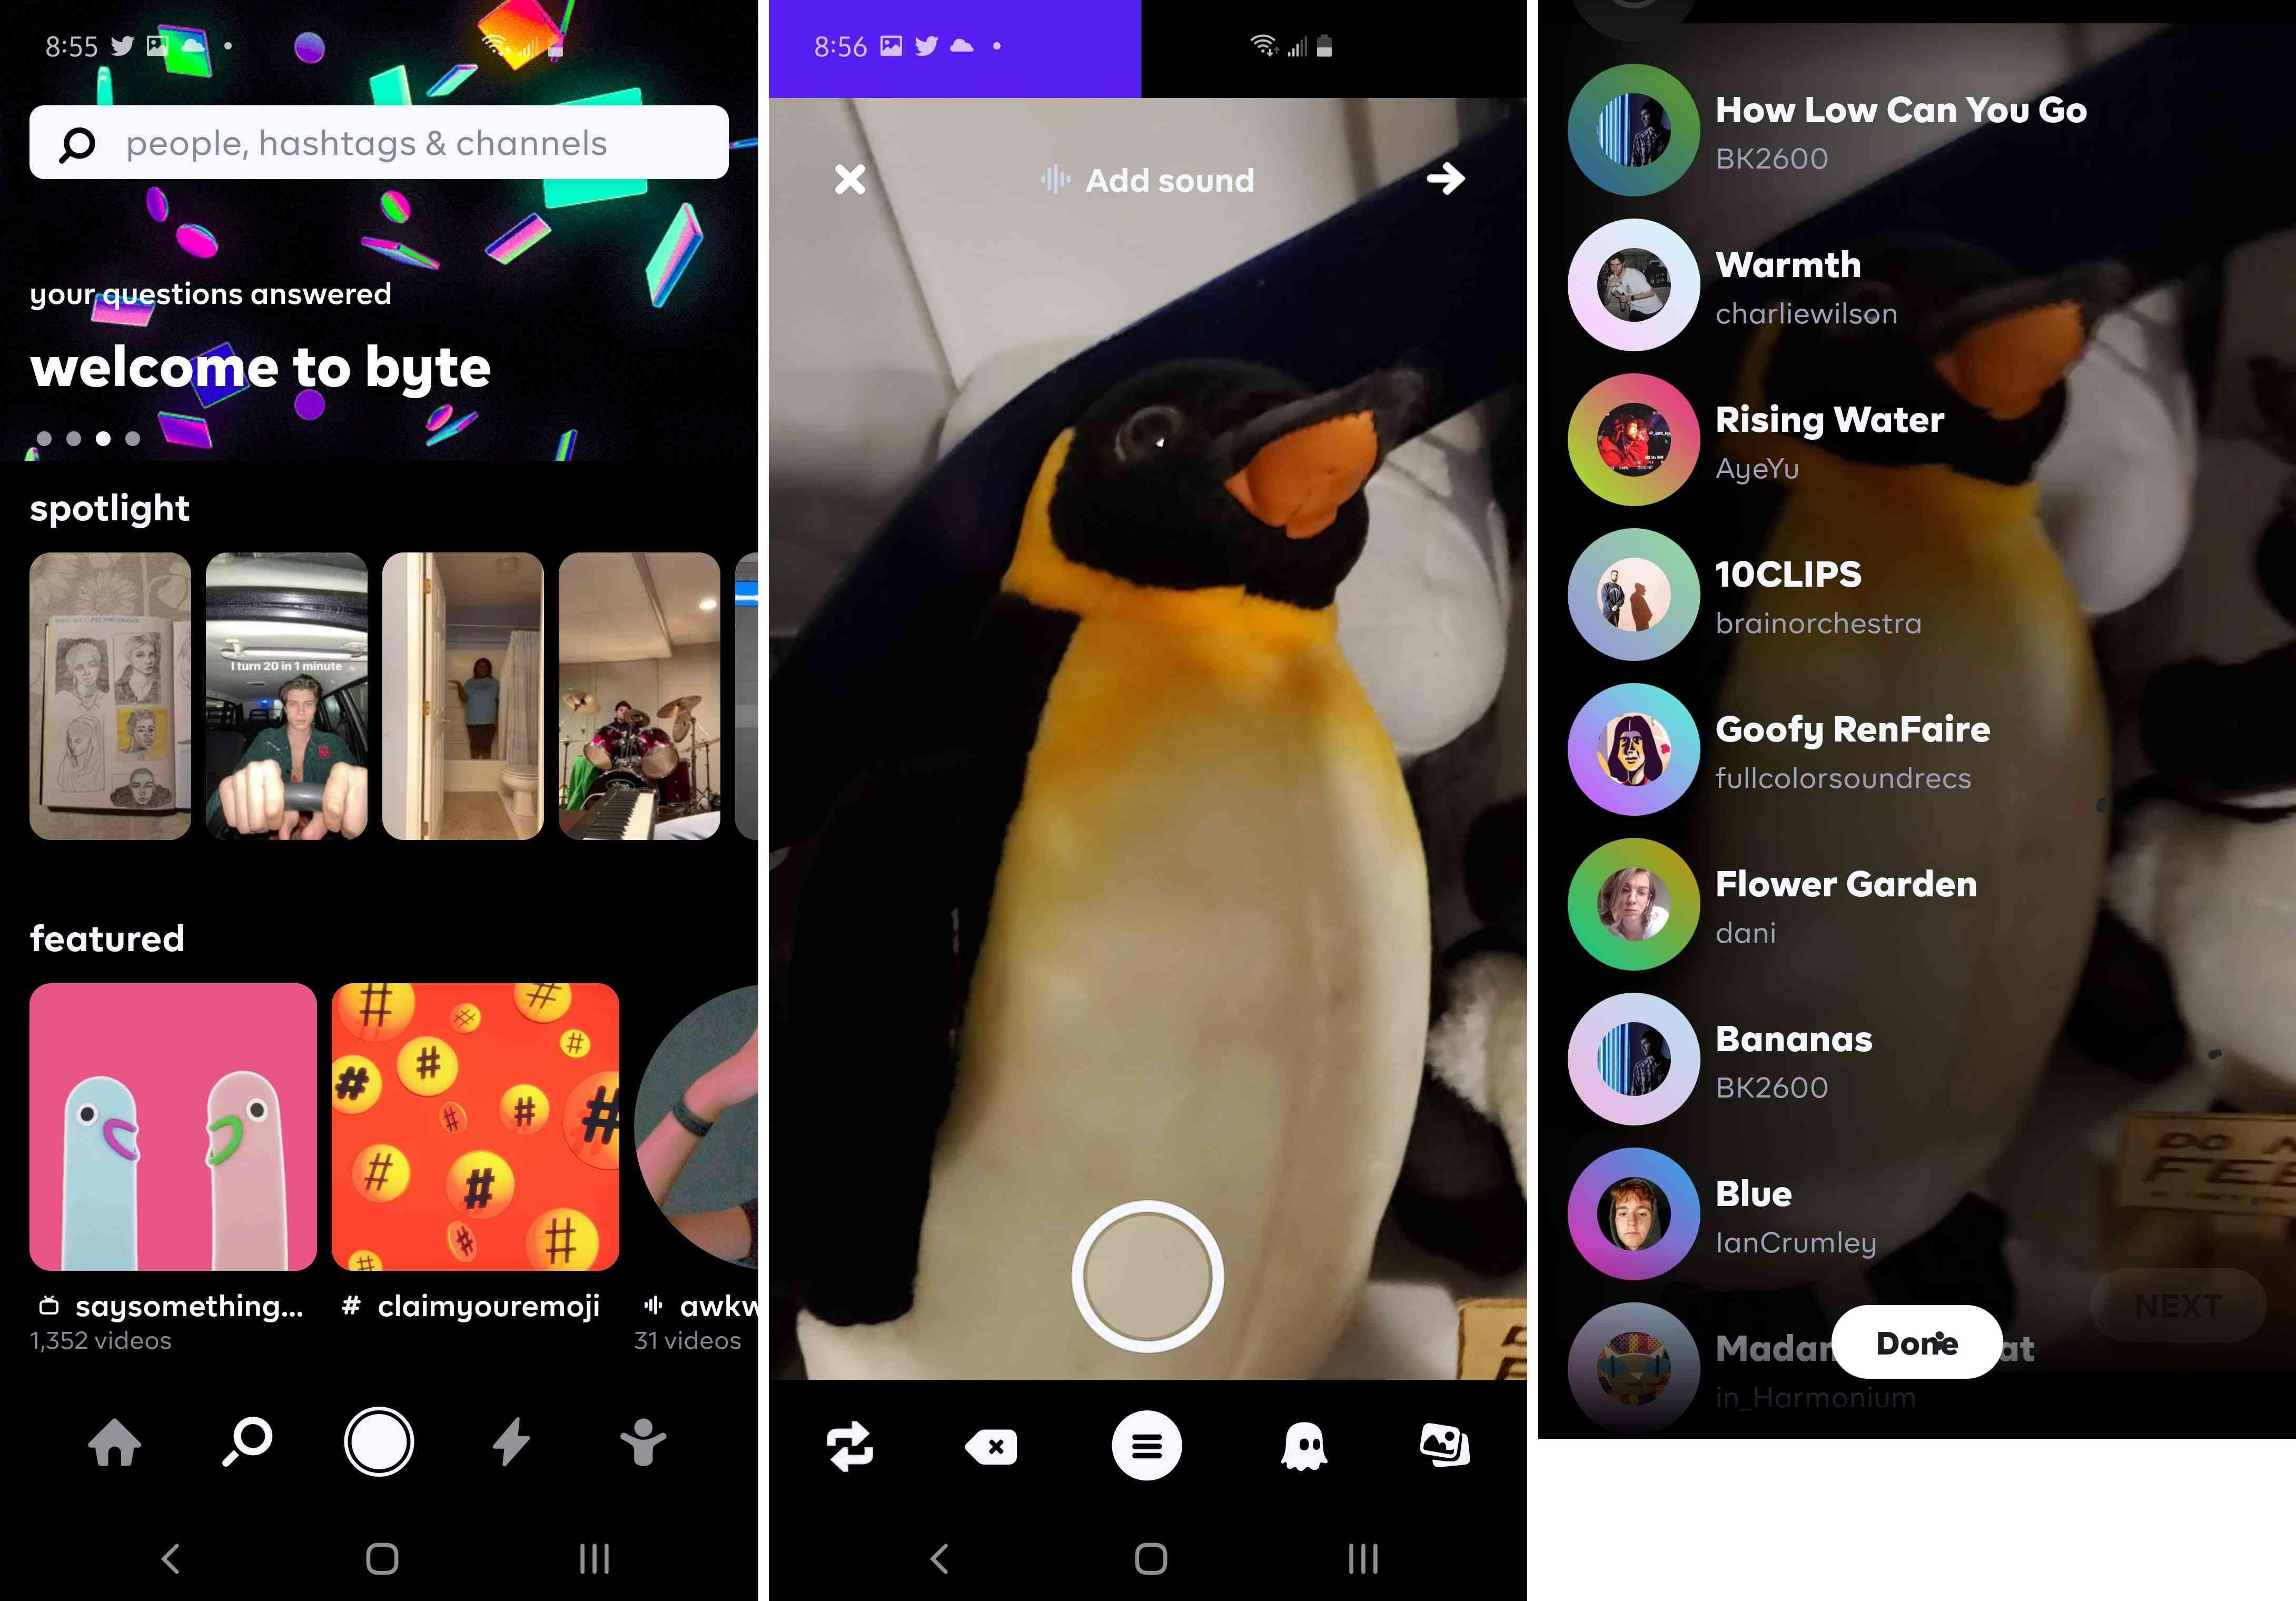 Three views of the Byte app